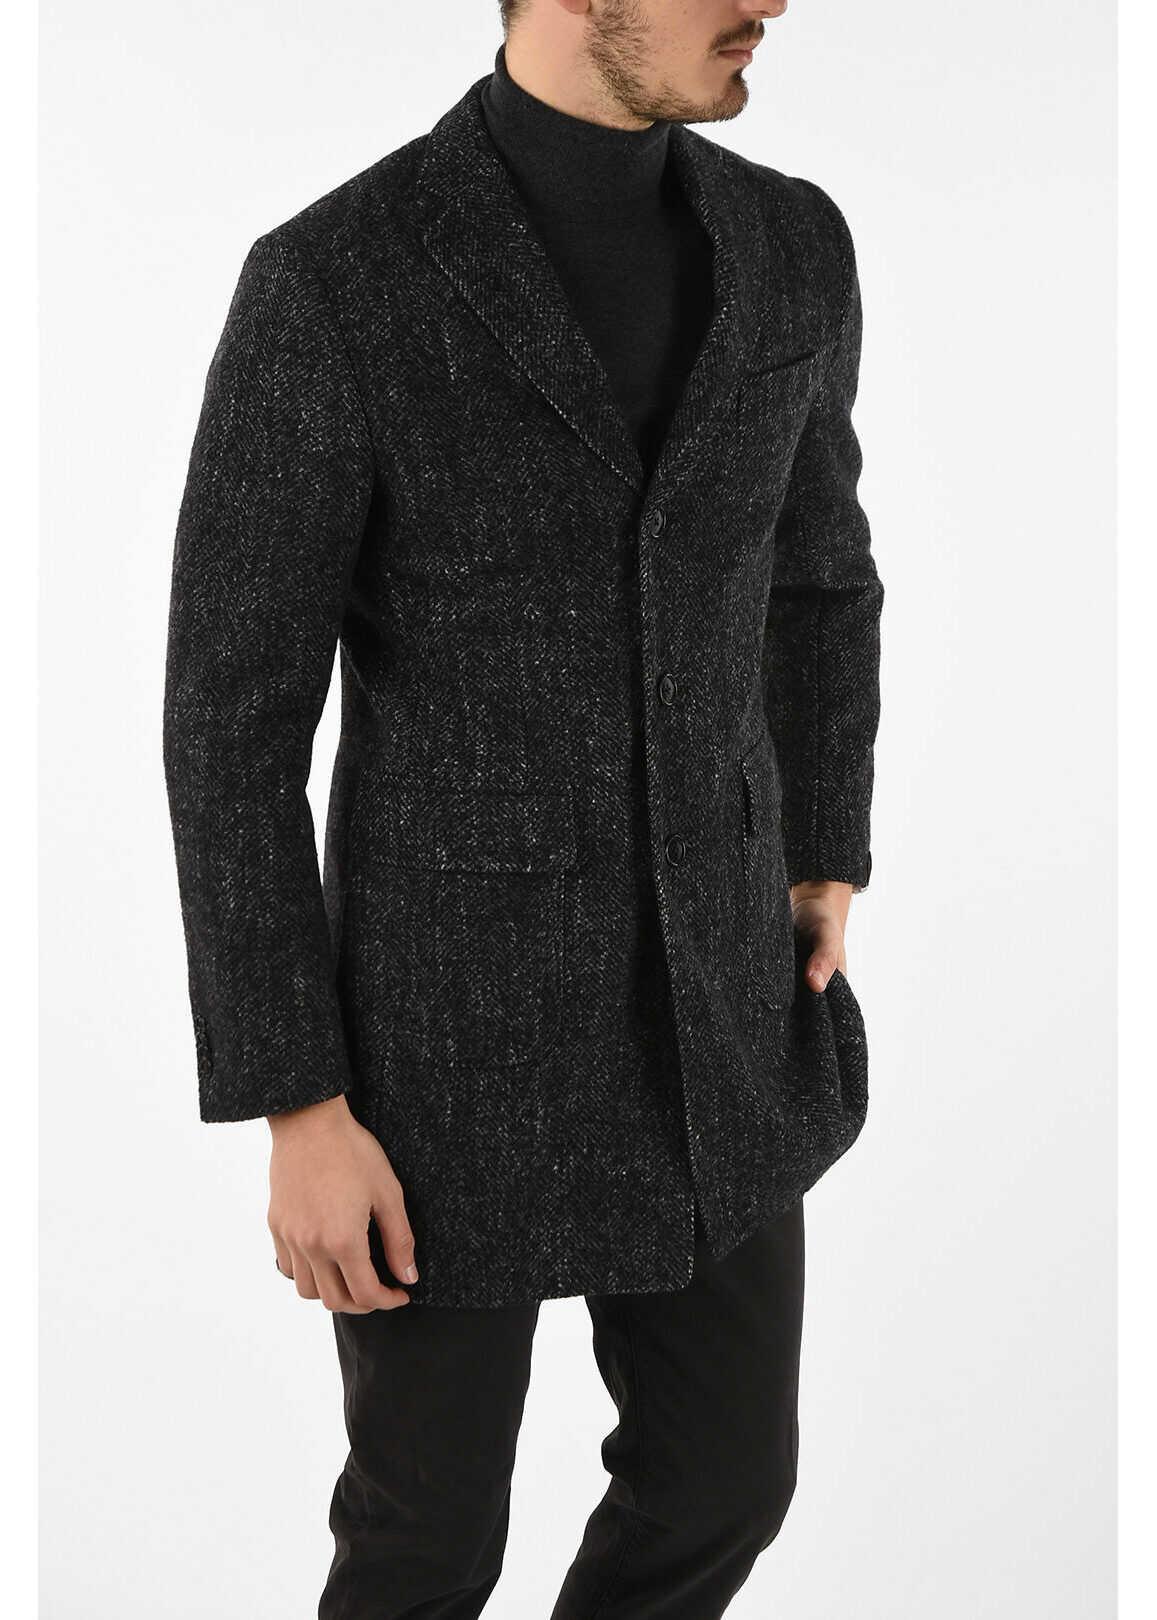 CORNELIANI plain herringbone 3-button chesterfield coat GRAY imagine